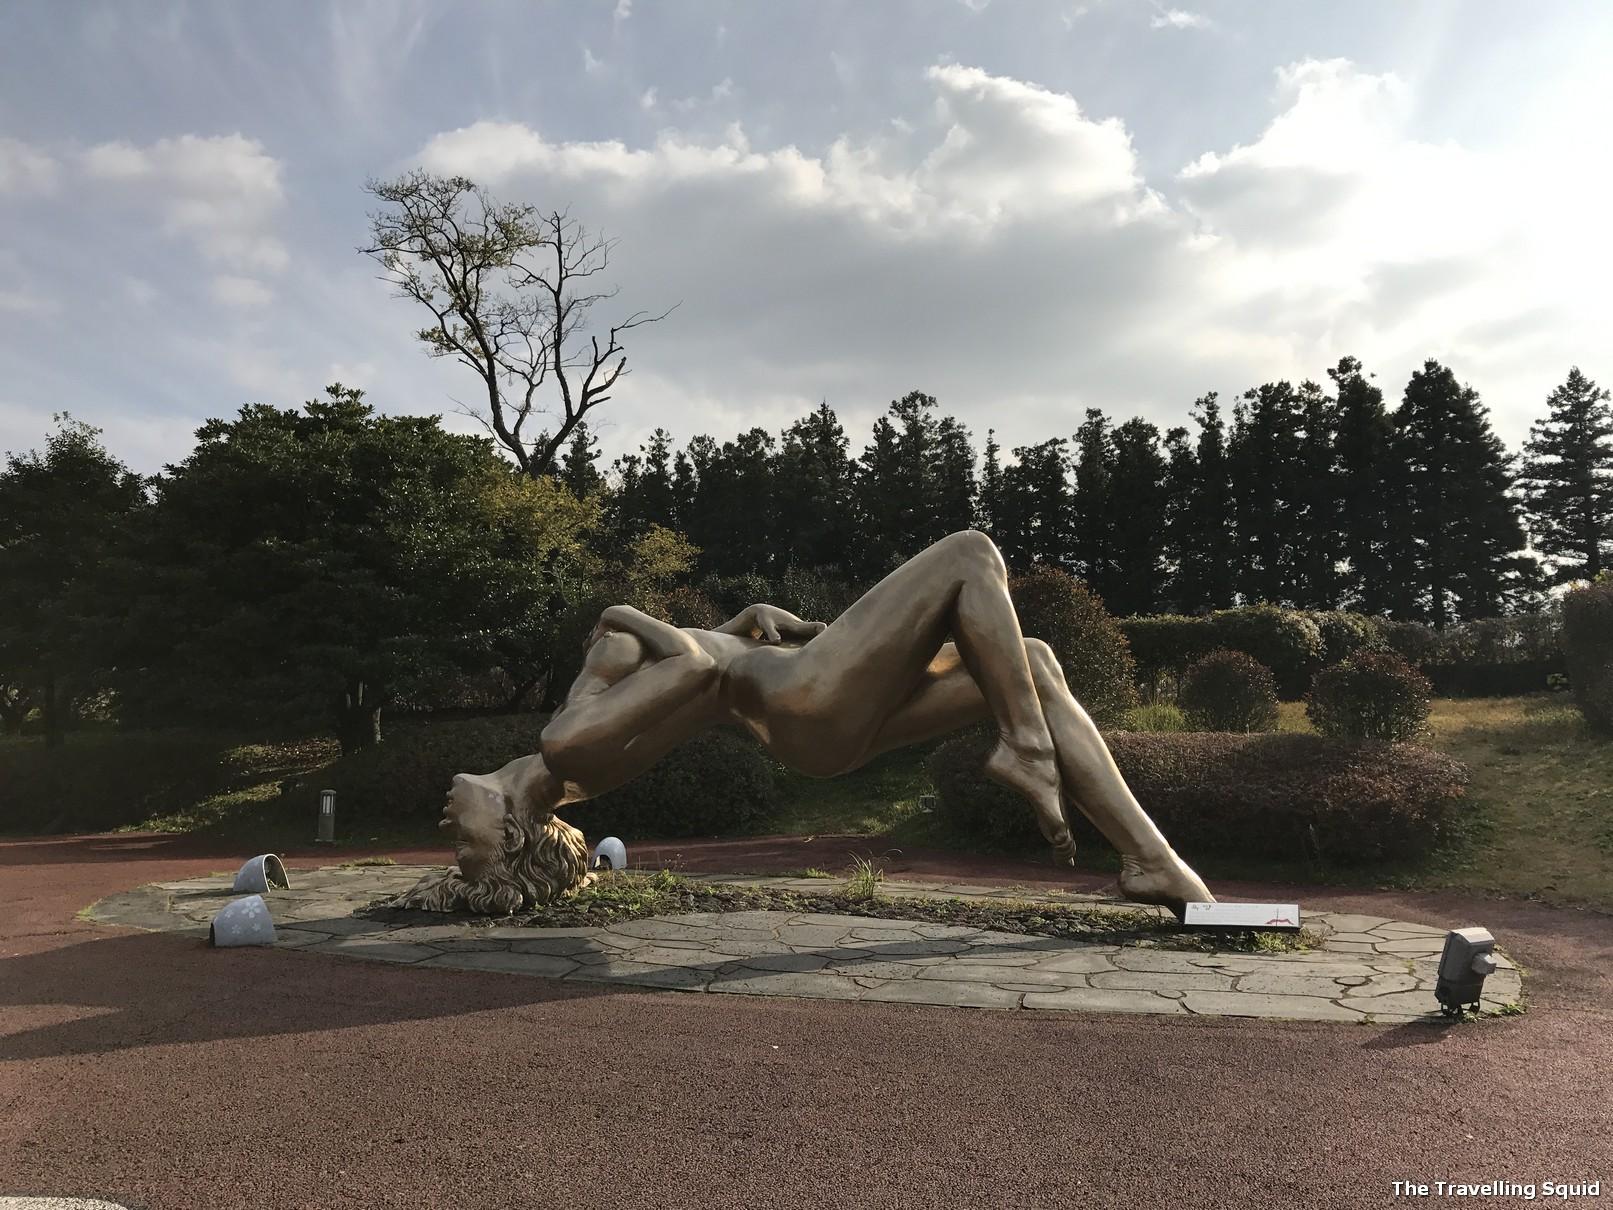 jeju loveland sculpture review